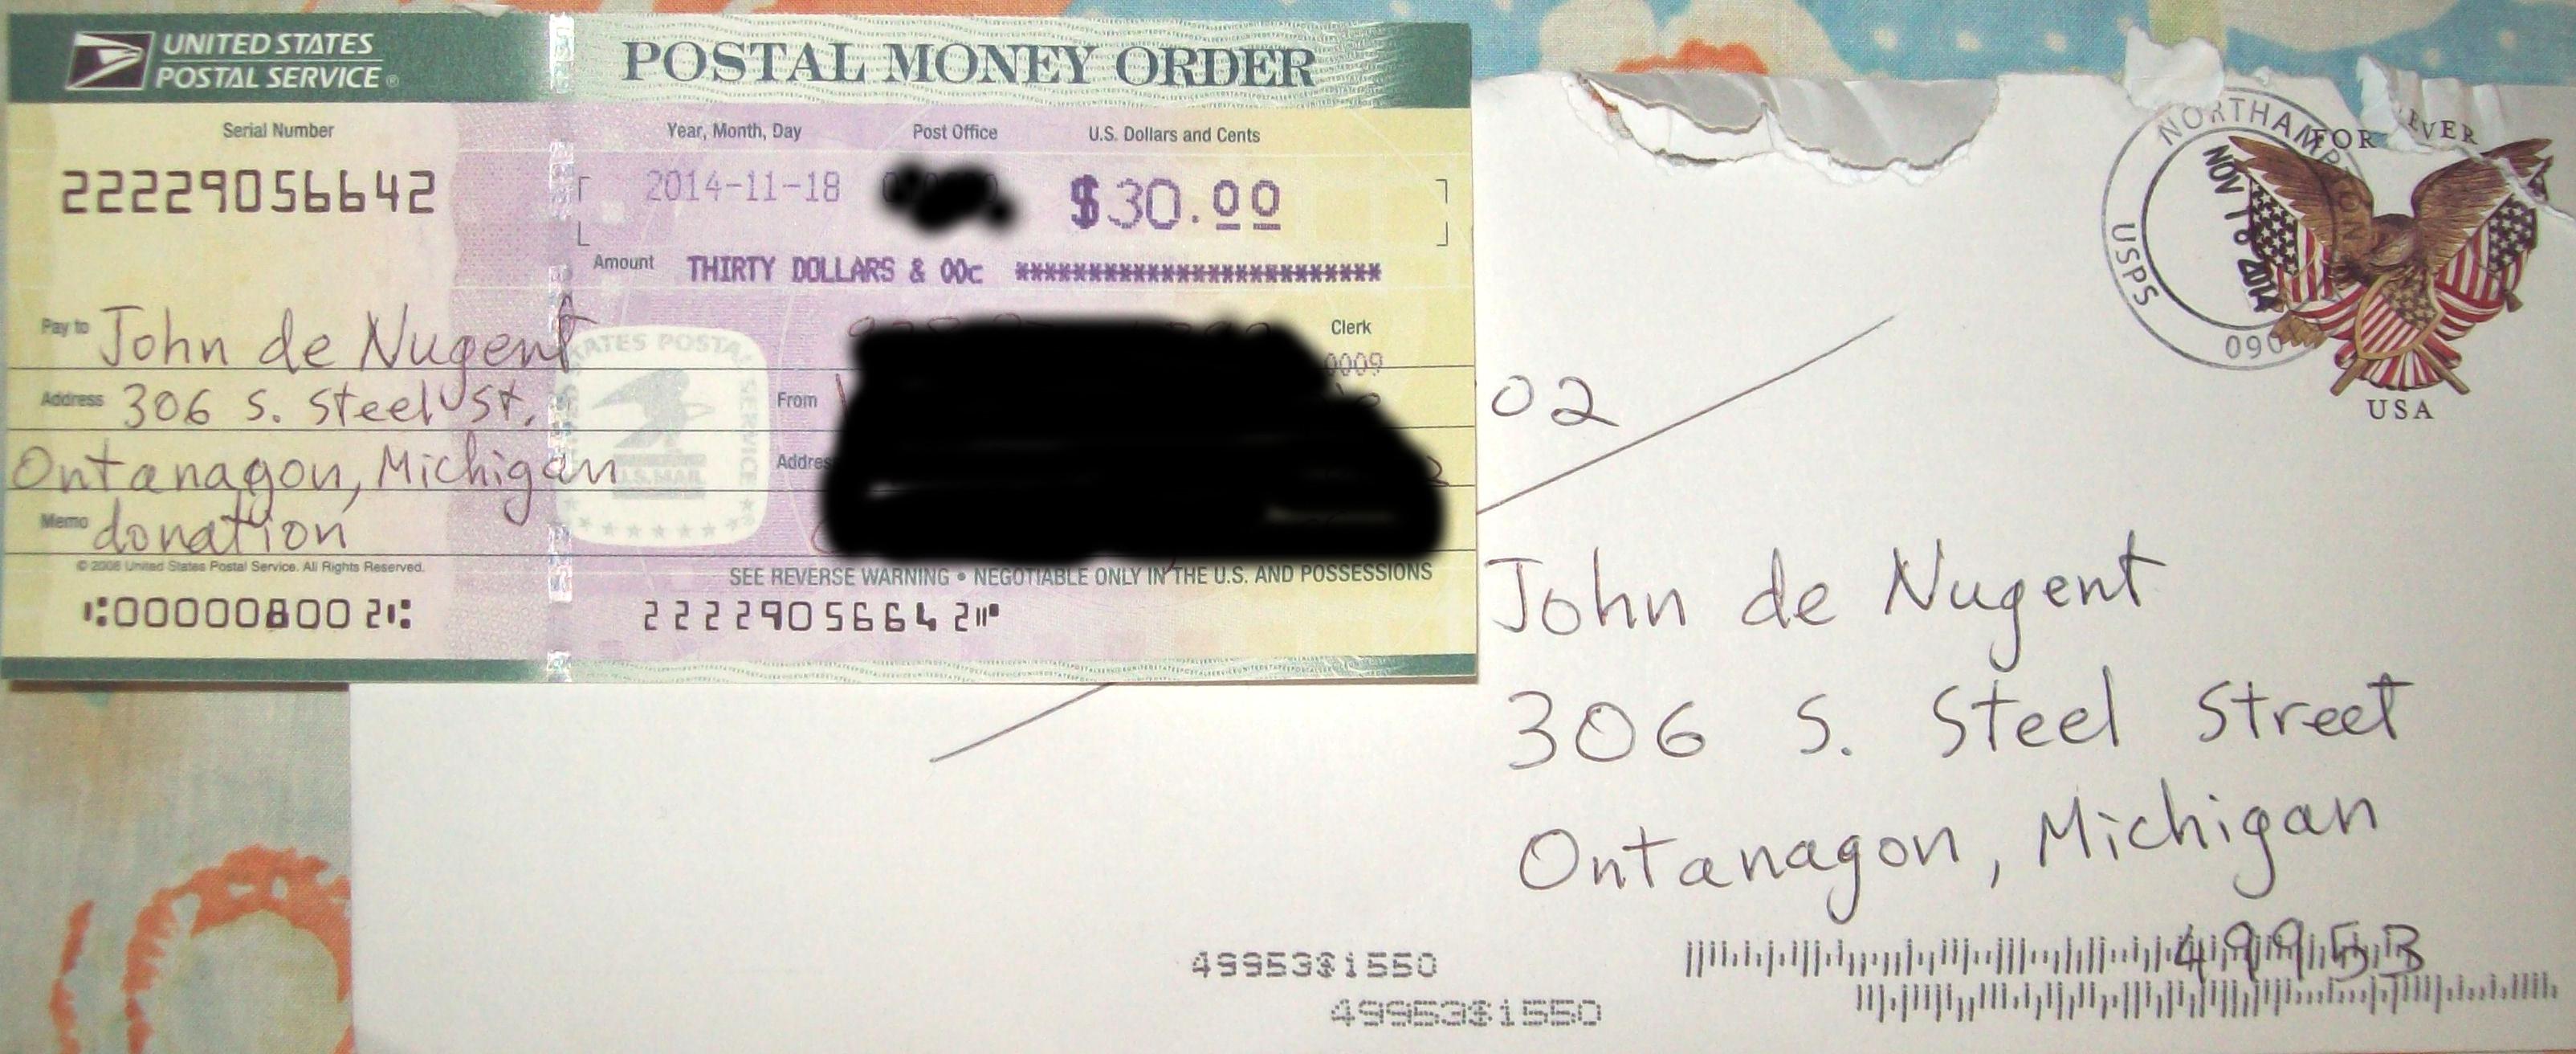 30dollarsuspsmoneyorder Money Order Cashier's Check Samples